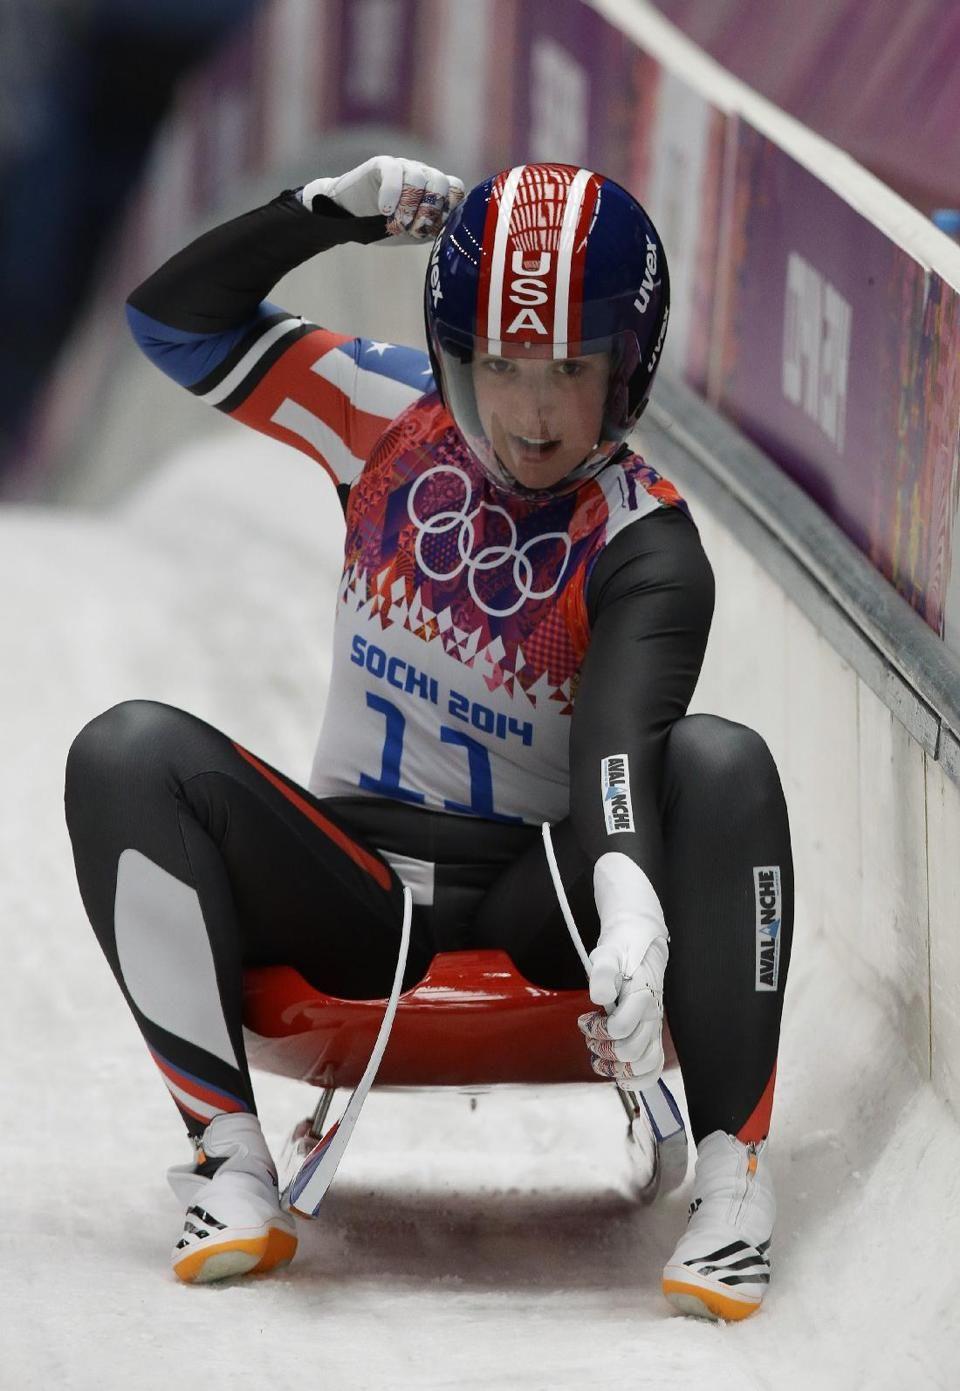 Natalie Geisenberger wins Olympic luge title Luge